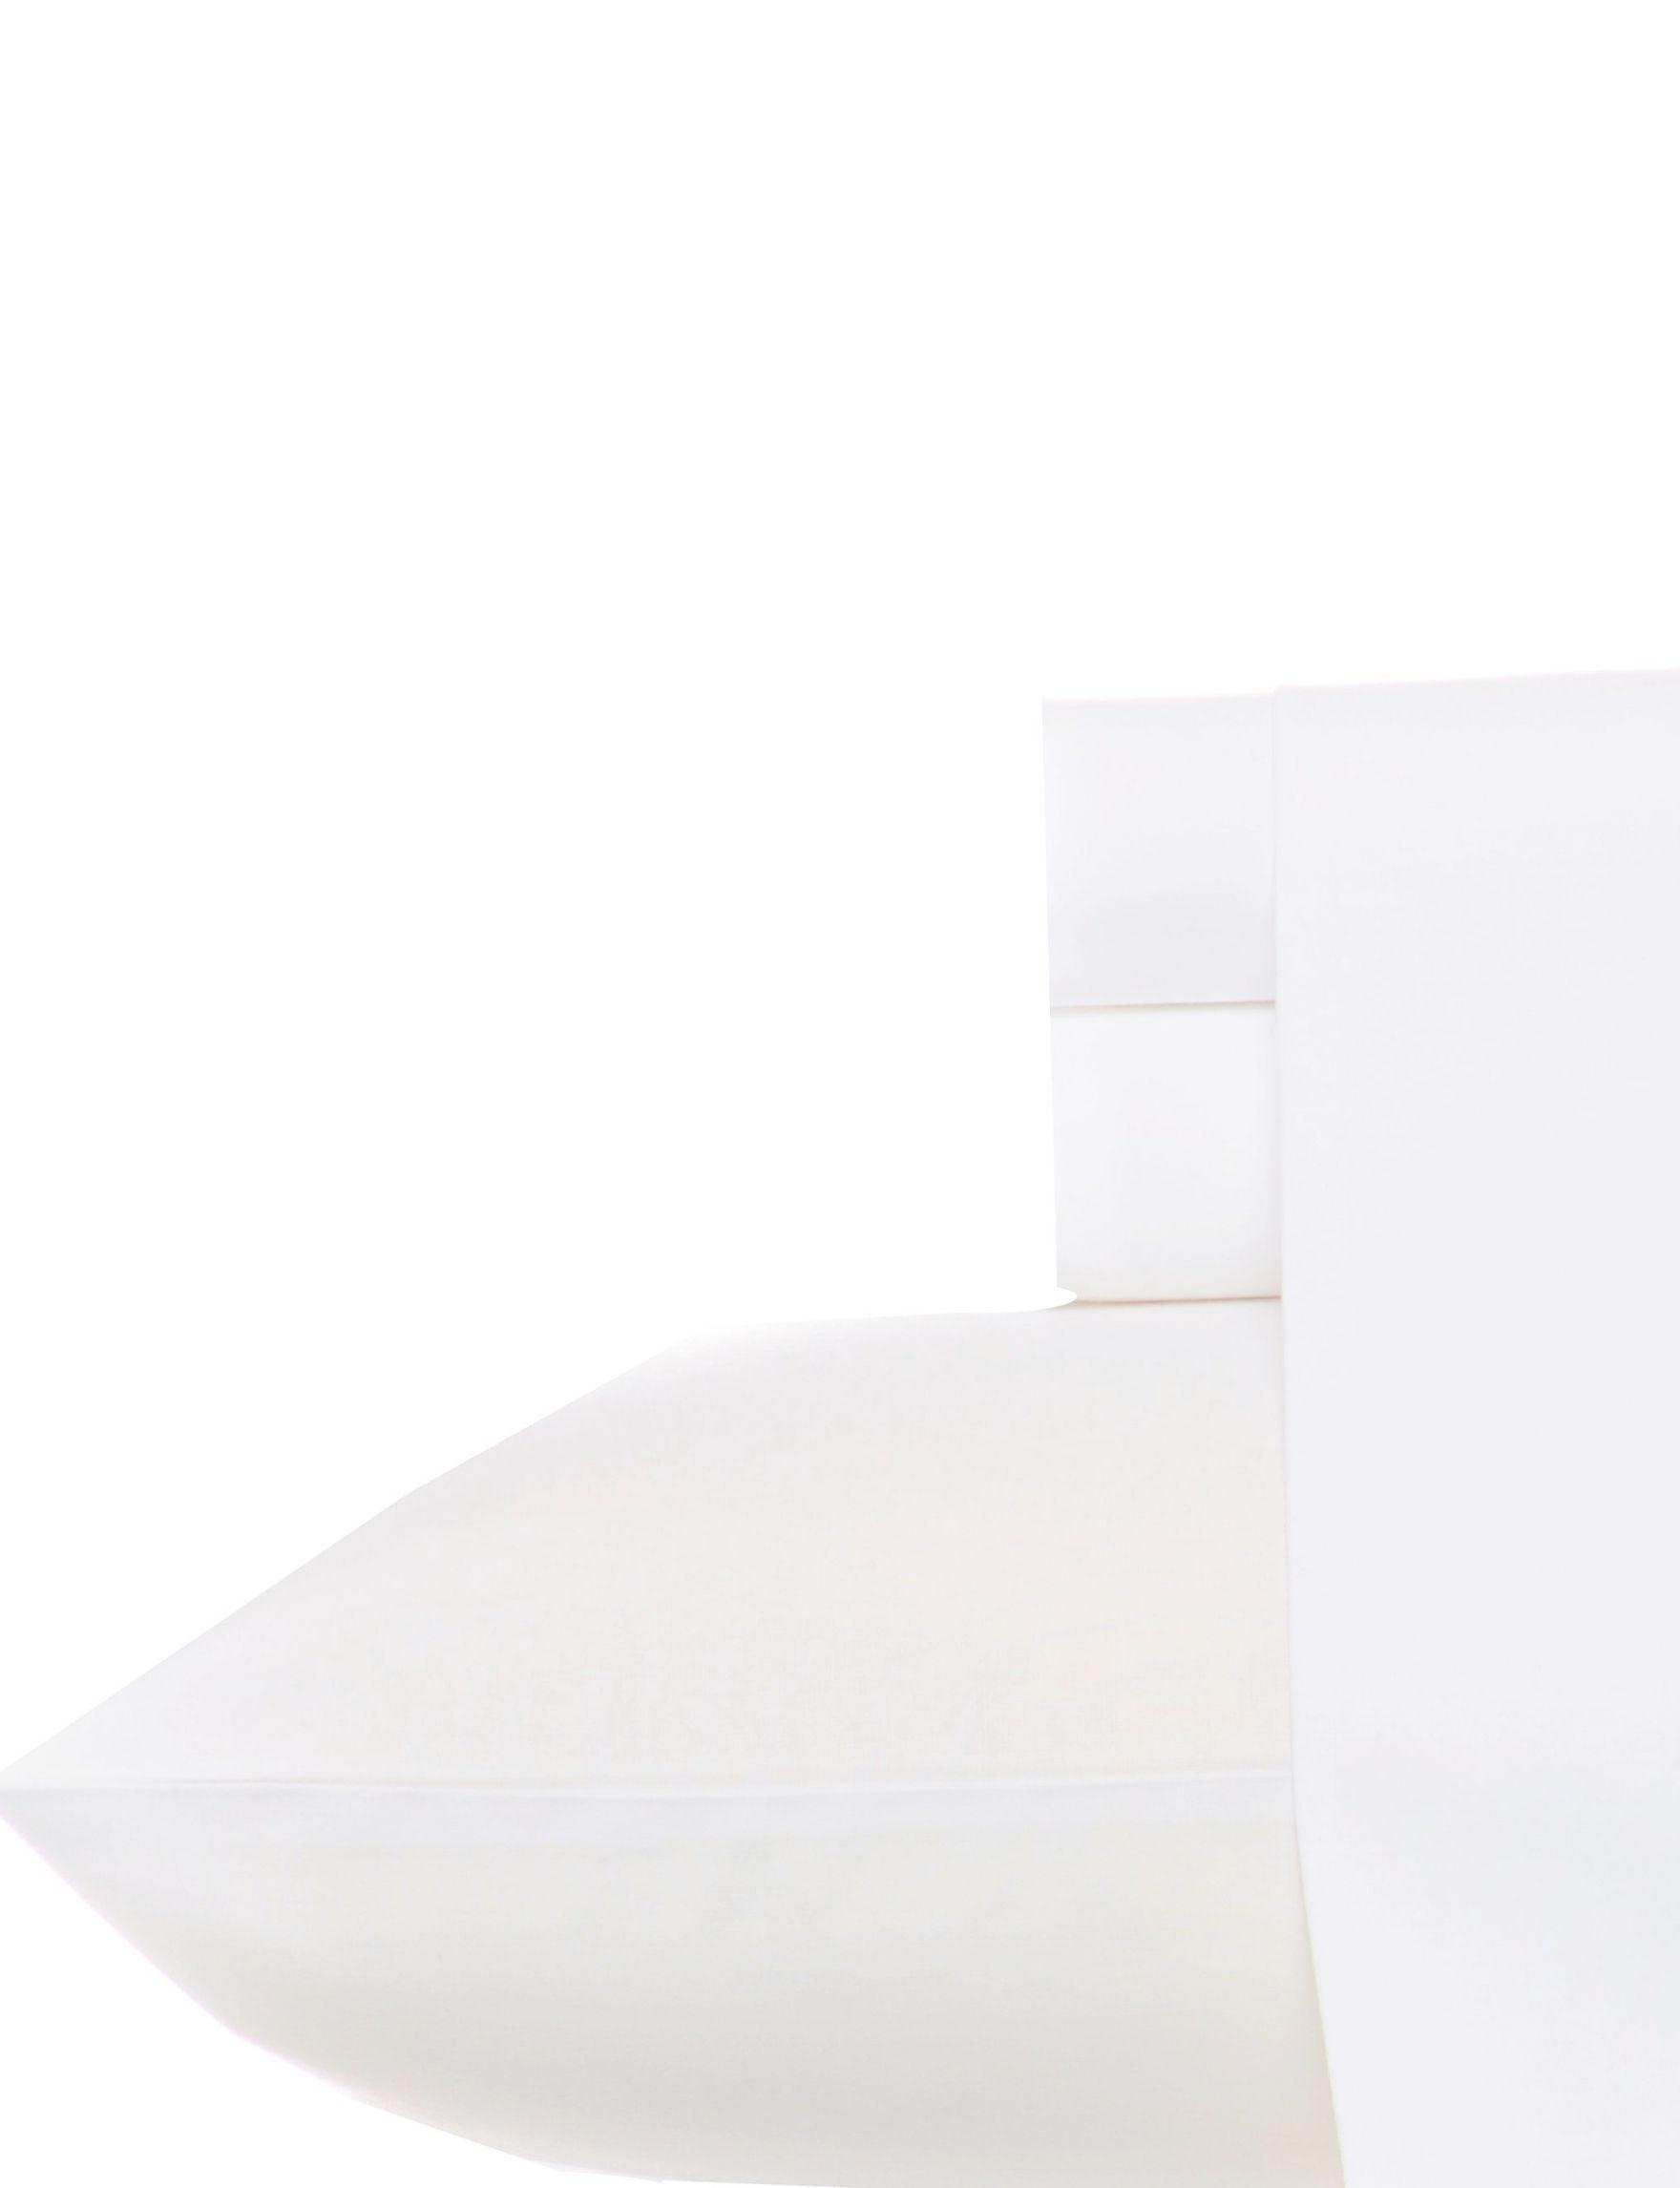 Nautica White Sheets & Pillowcases